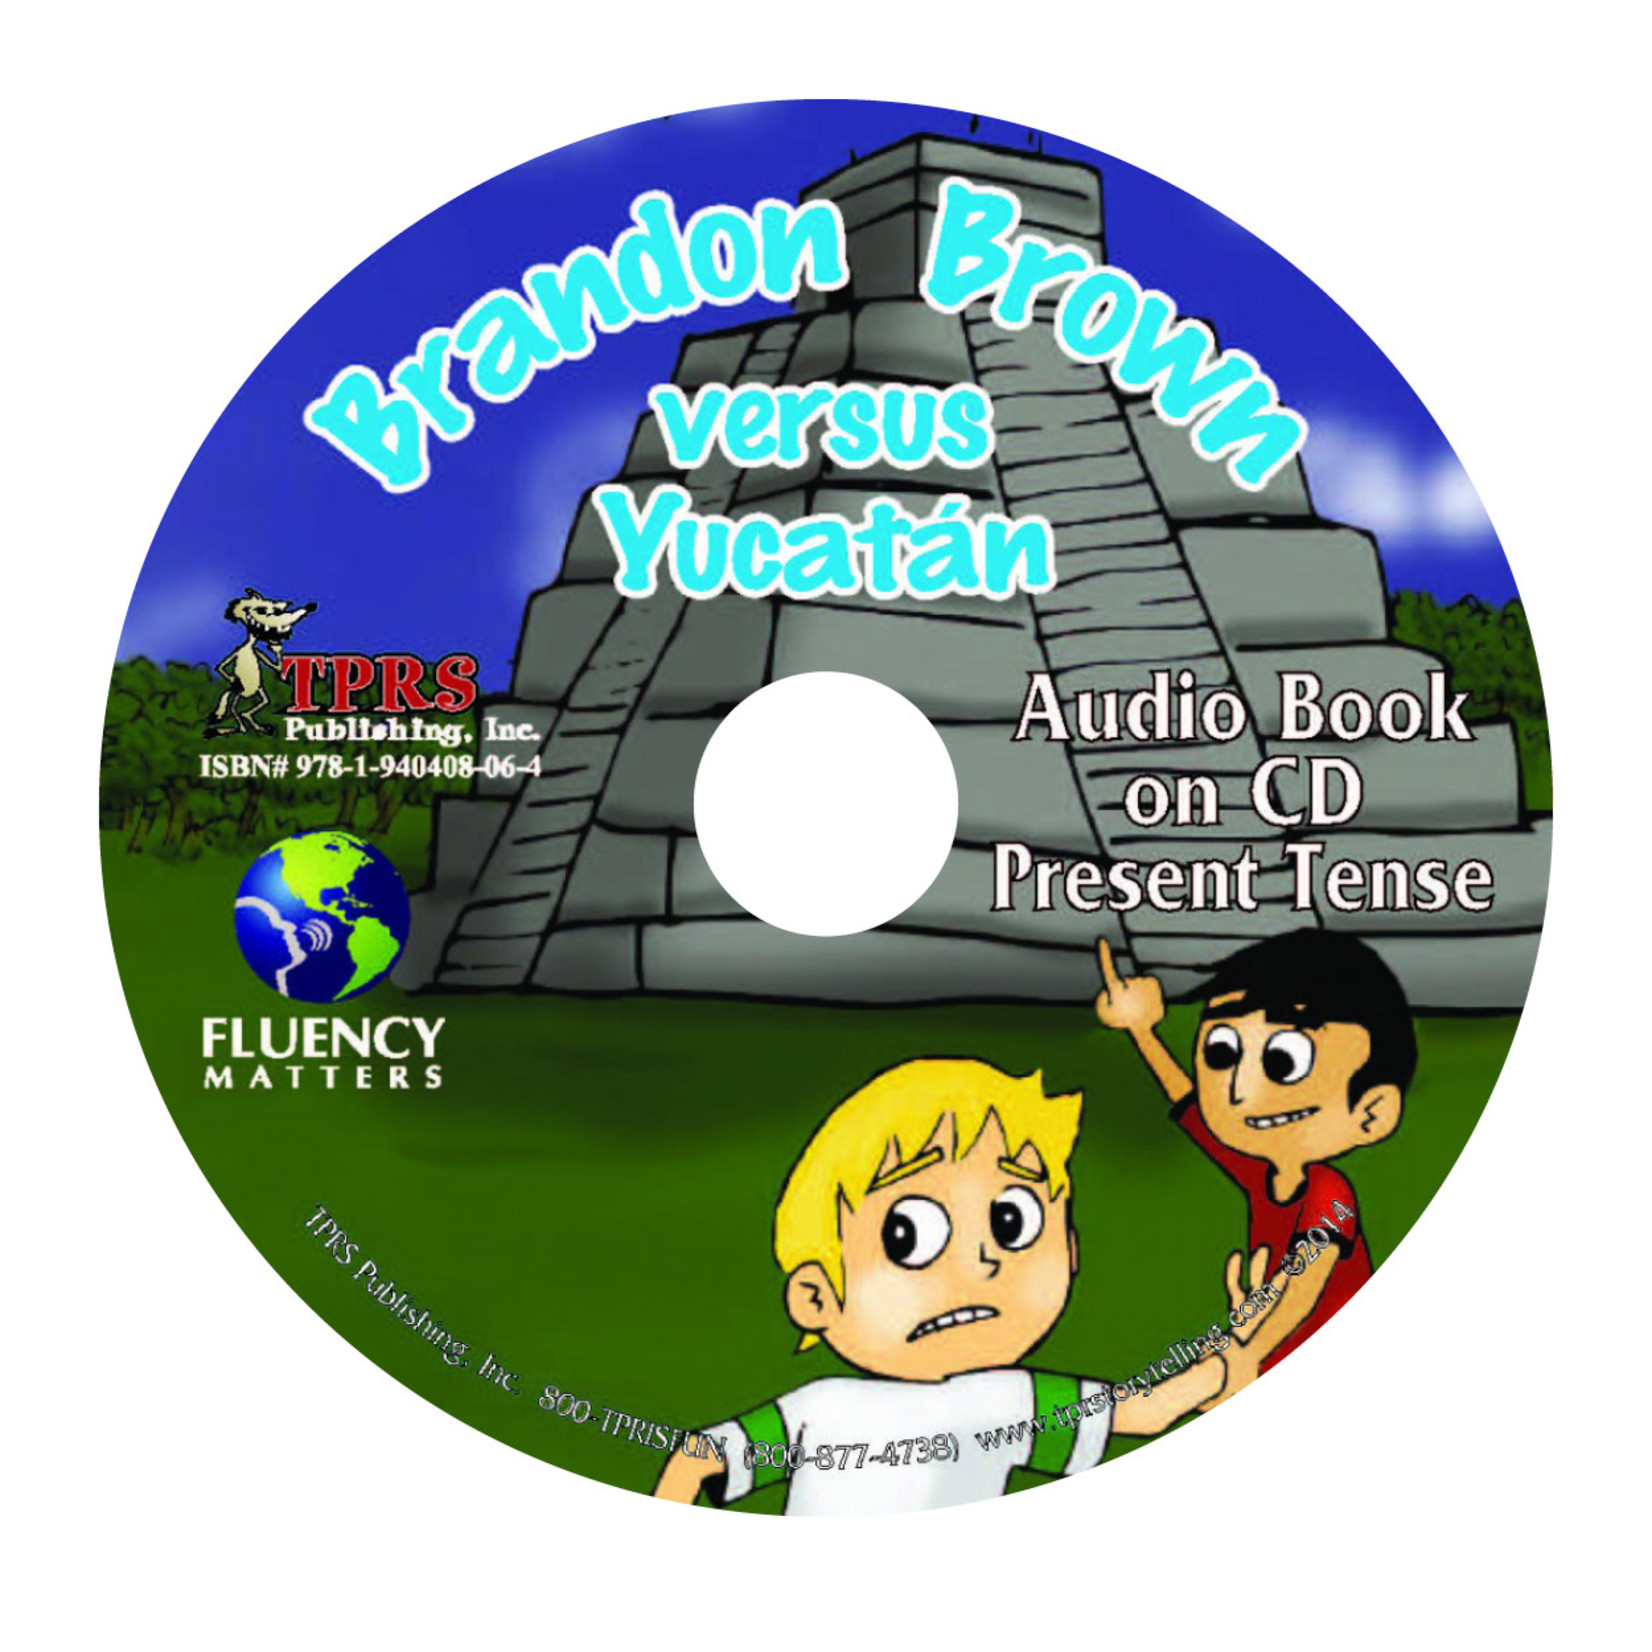 Fluency Matters Brandon Brown versus Yucatán - Audio Book